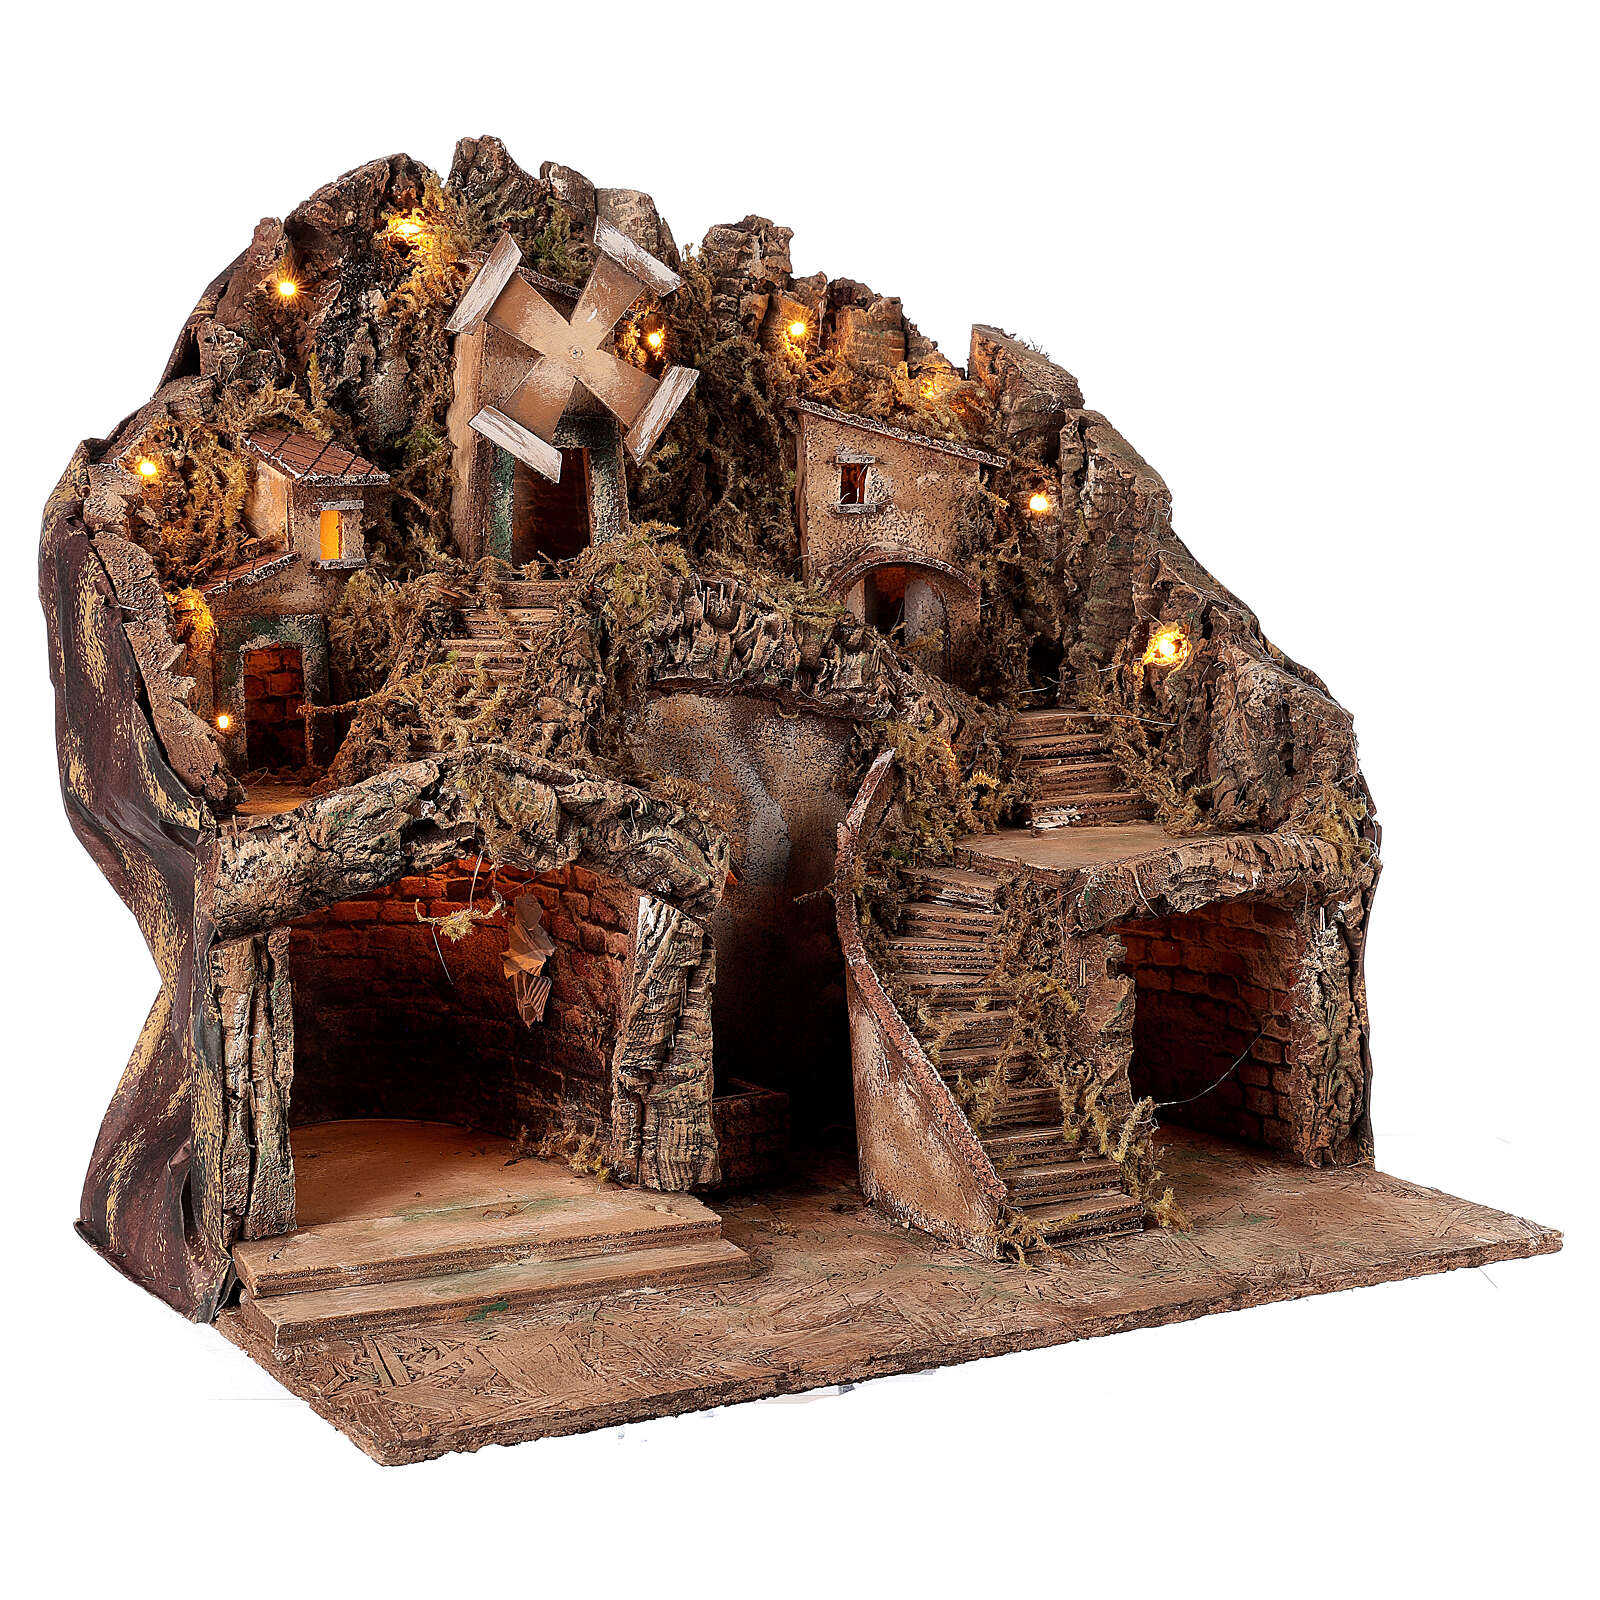 Neapolitan Nativity Scene setting fountain and windmill for 10-12 cm figurines 50x60x50 cm 4